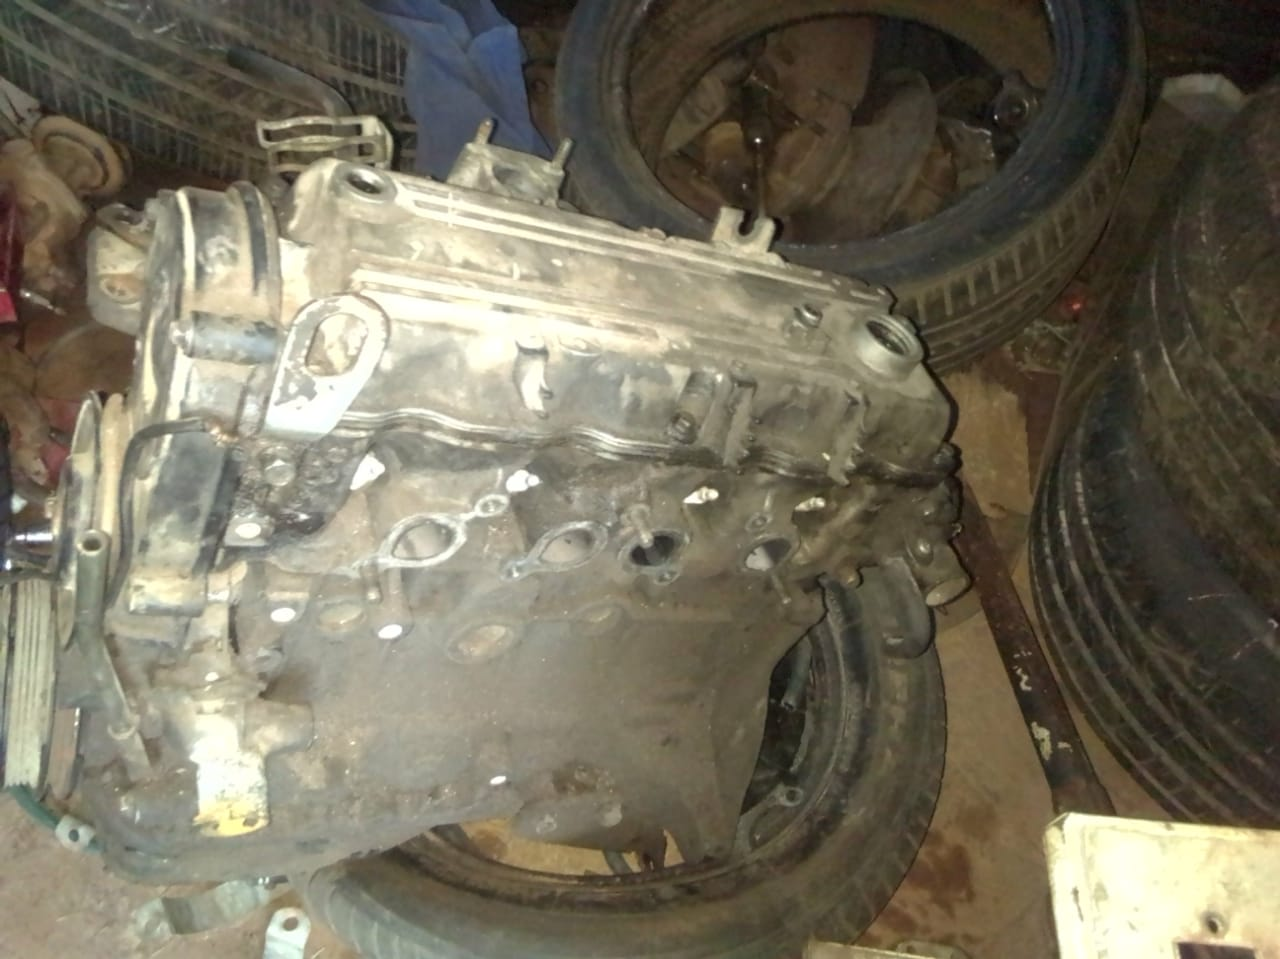 Mazda 323 engine for sale